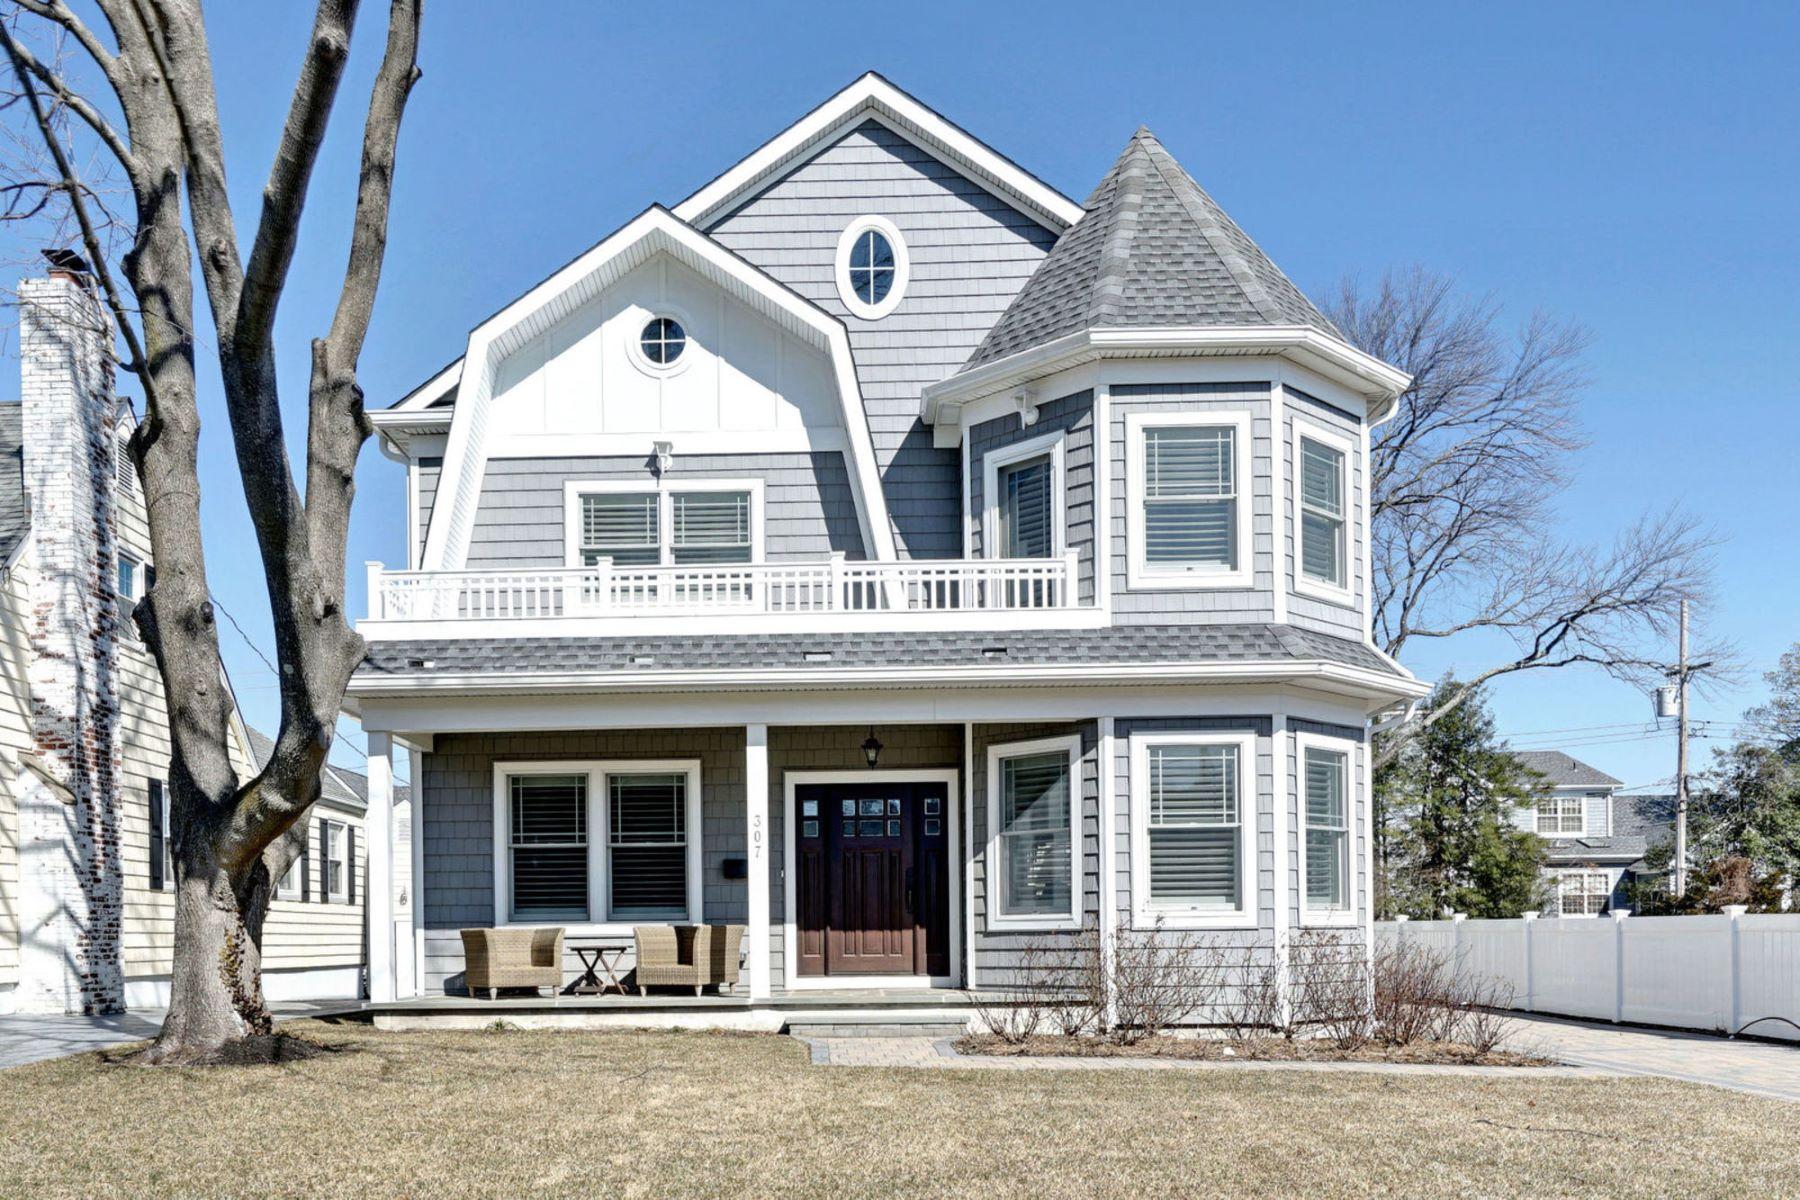 Single Family Homes for Sale at Elegant Coastal Living 307 Stockton Boulevard, Sea Girt, New Jersey 08750 United States